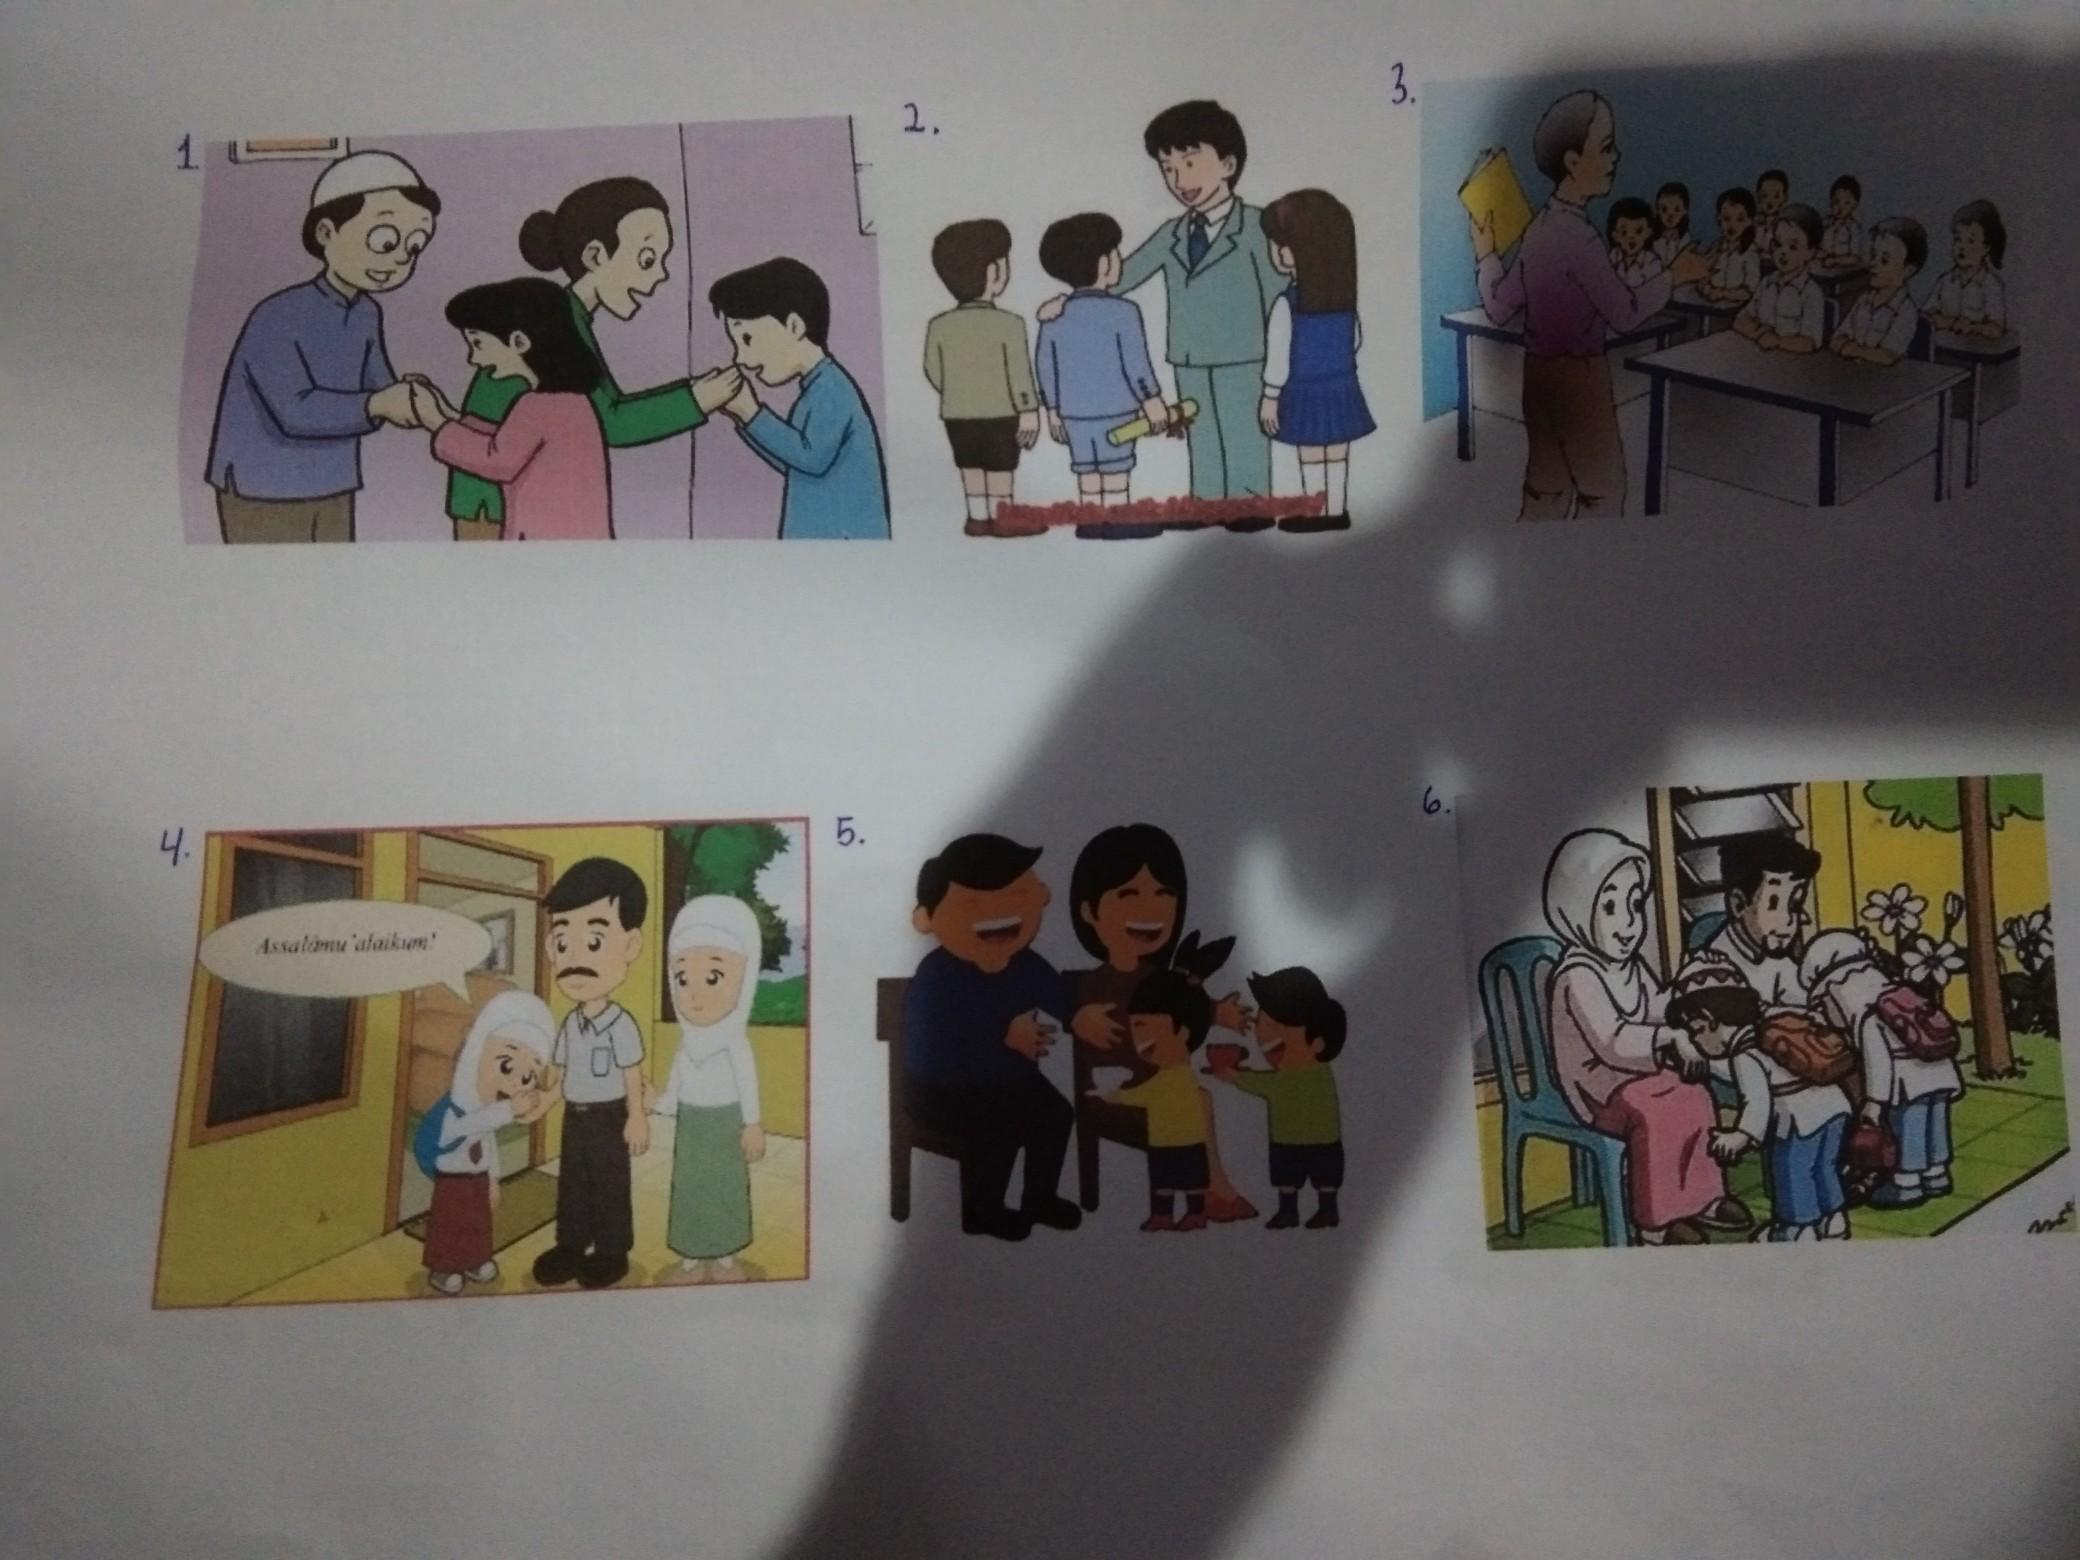 Tuliskan Keterangan Dalam Satu Gambar Empati Menghormati Orang Tua